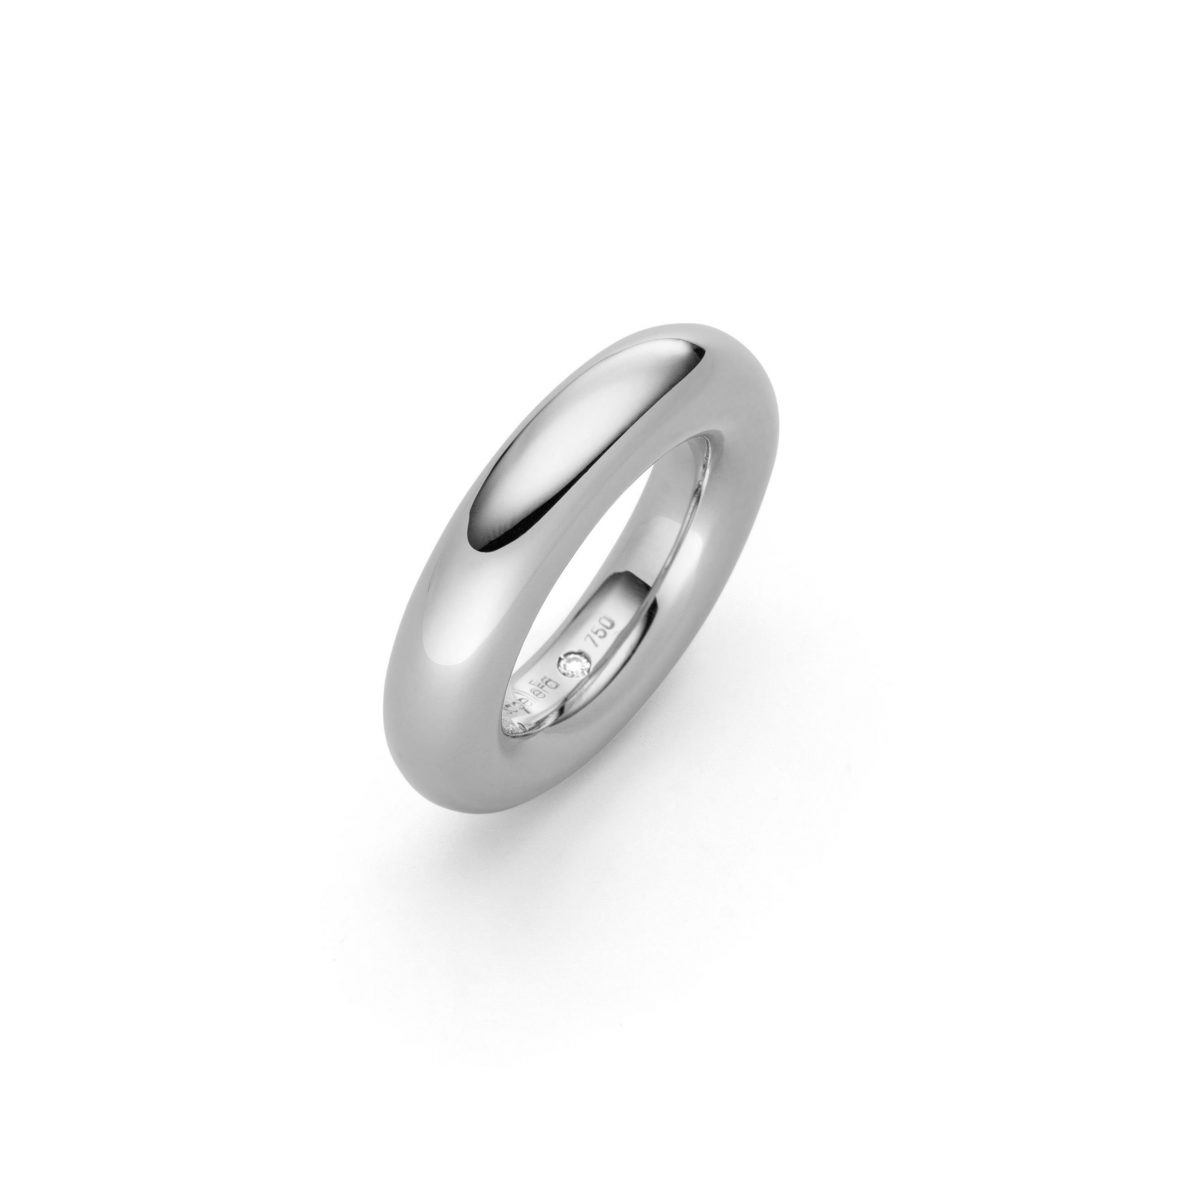 Ring Rotond 18ct Weißgold - IsabelleFa - 02024/06RIN-WG